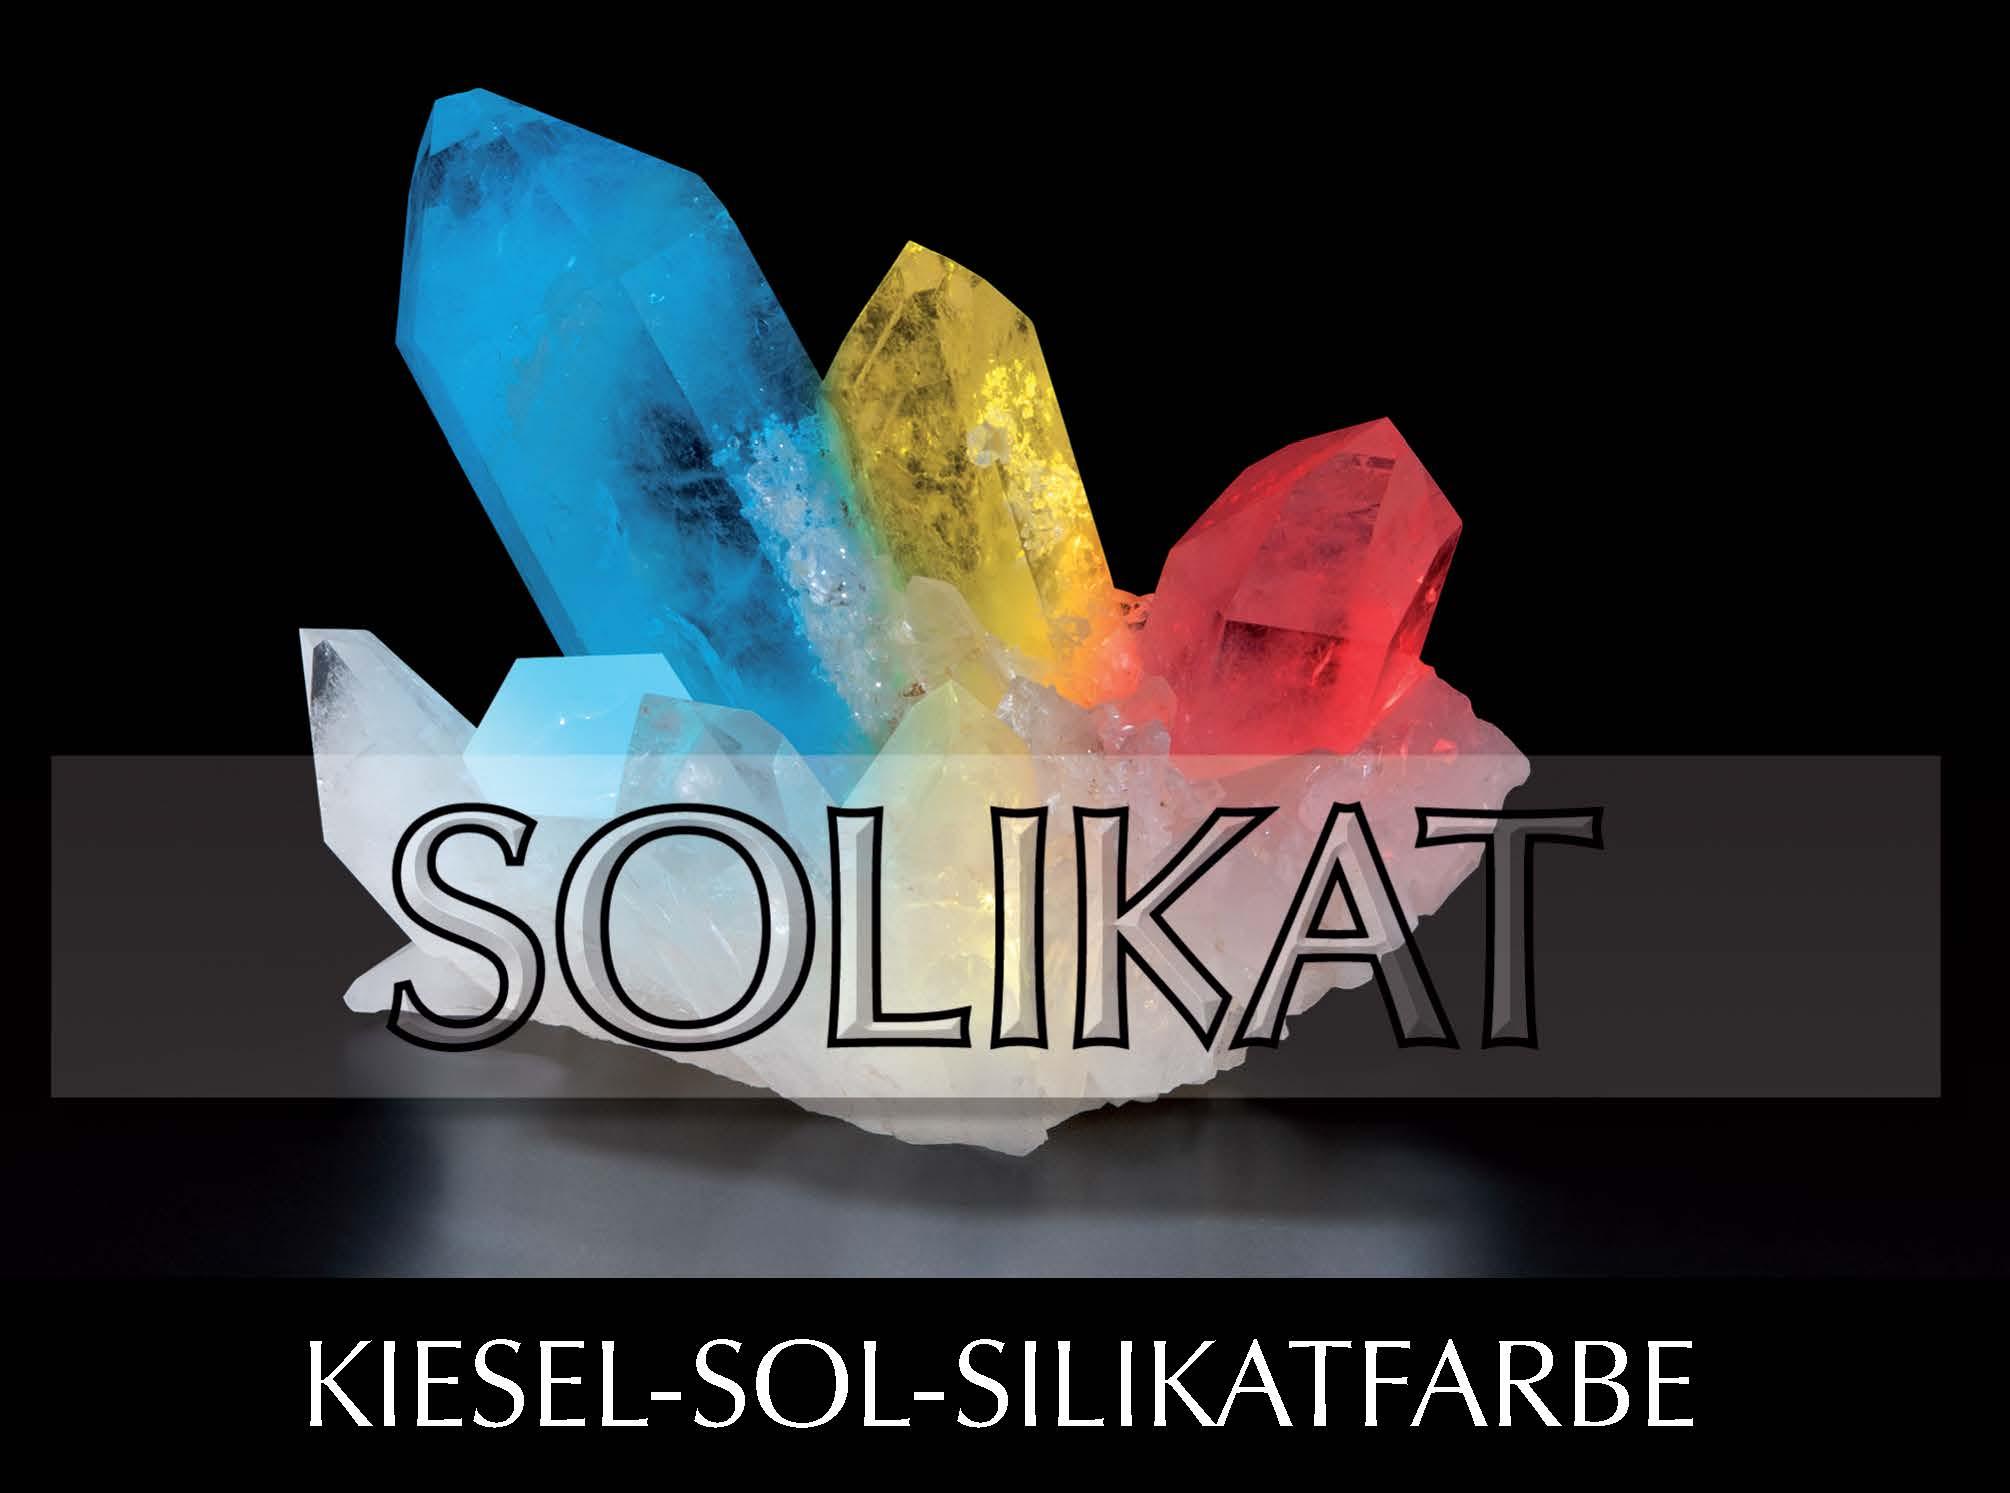 SOLIKAT  -  vorverkieselte Kiesel-Sol-Silikatfarbe